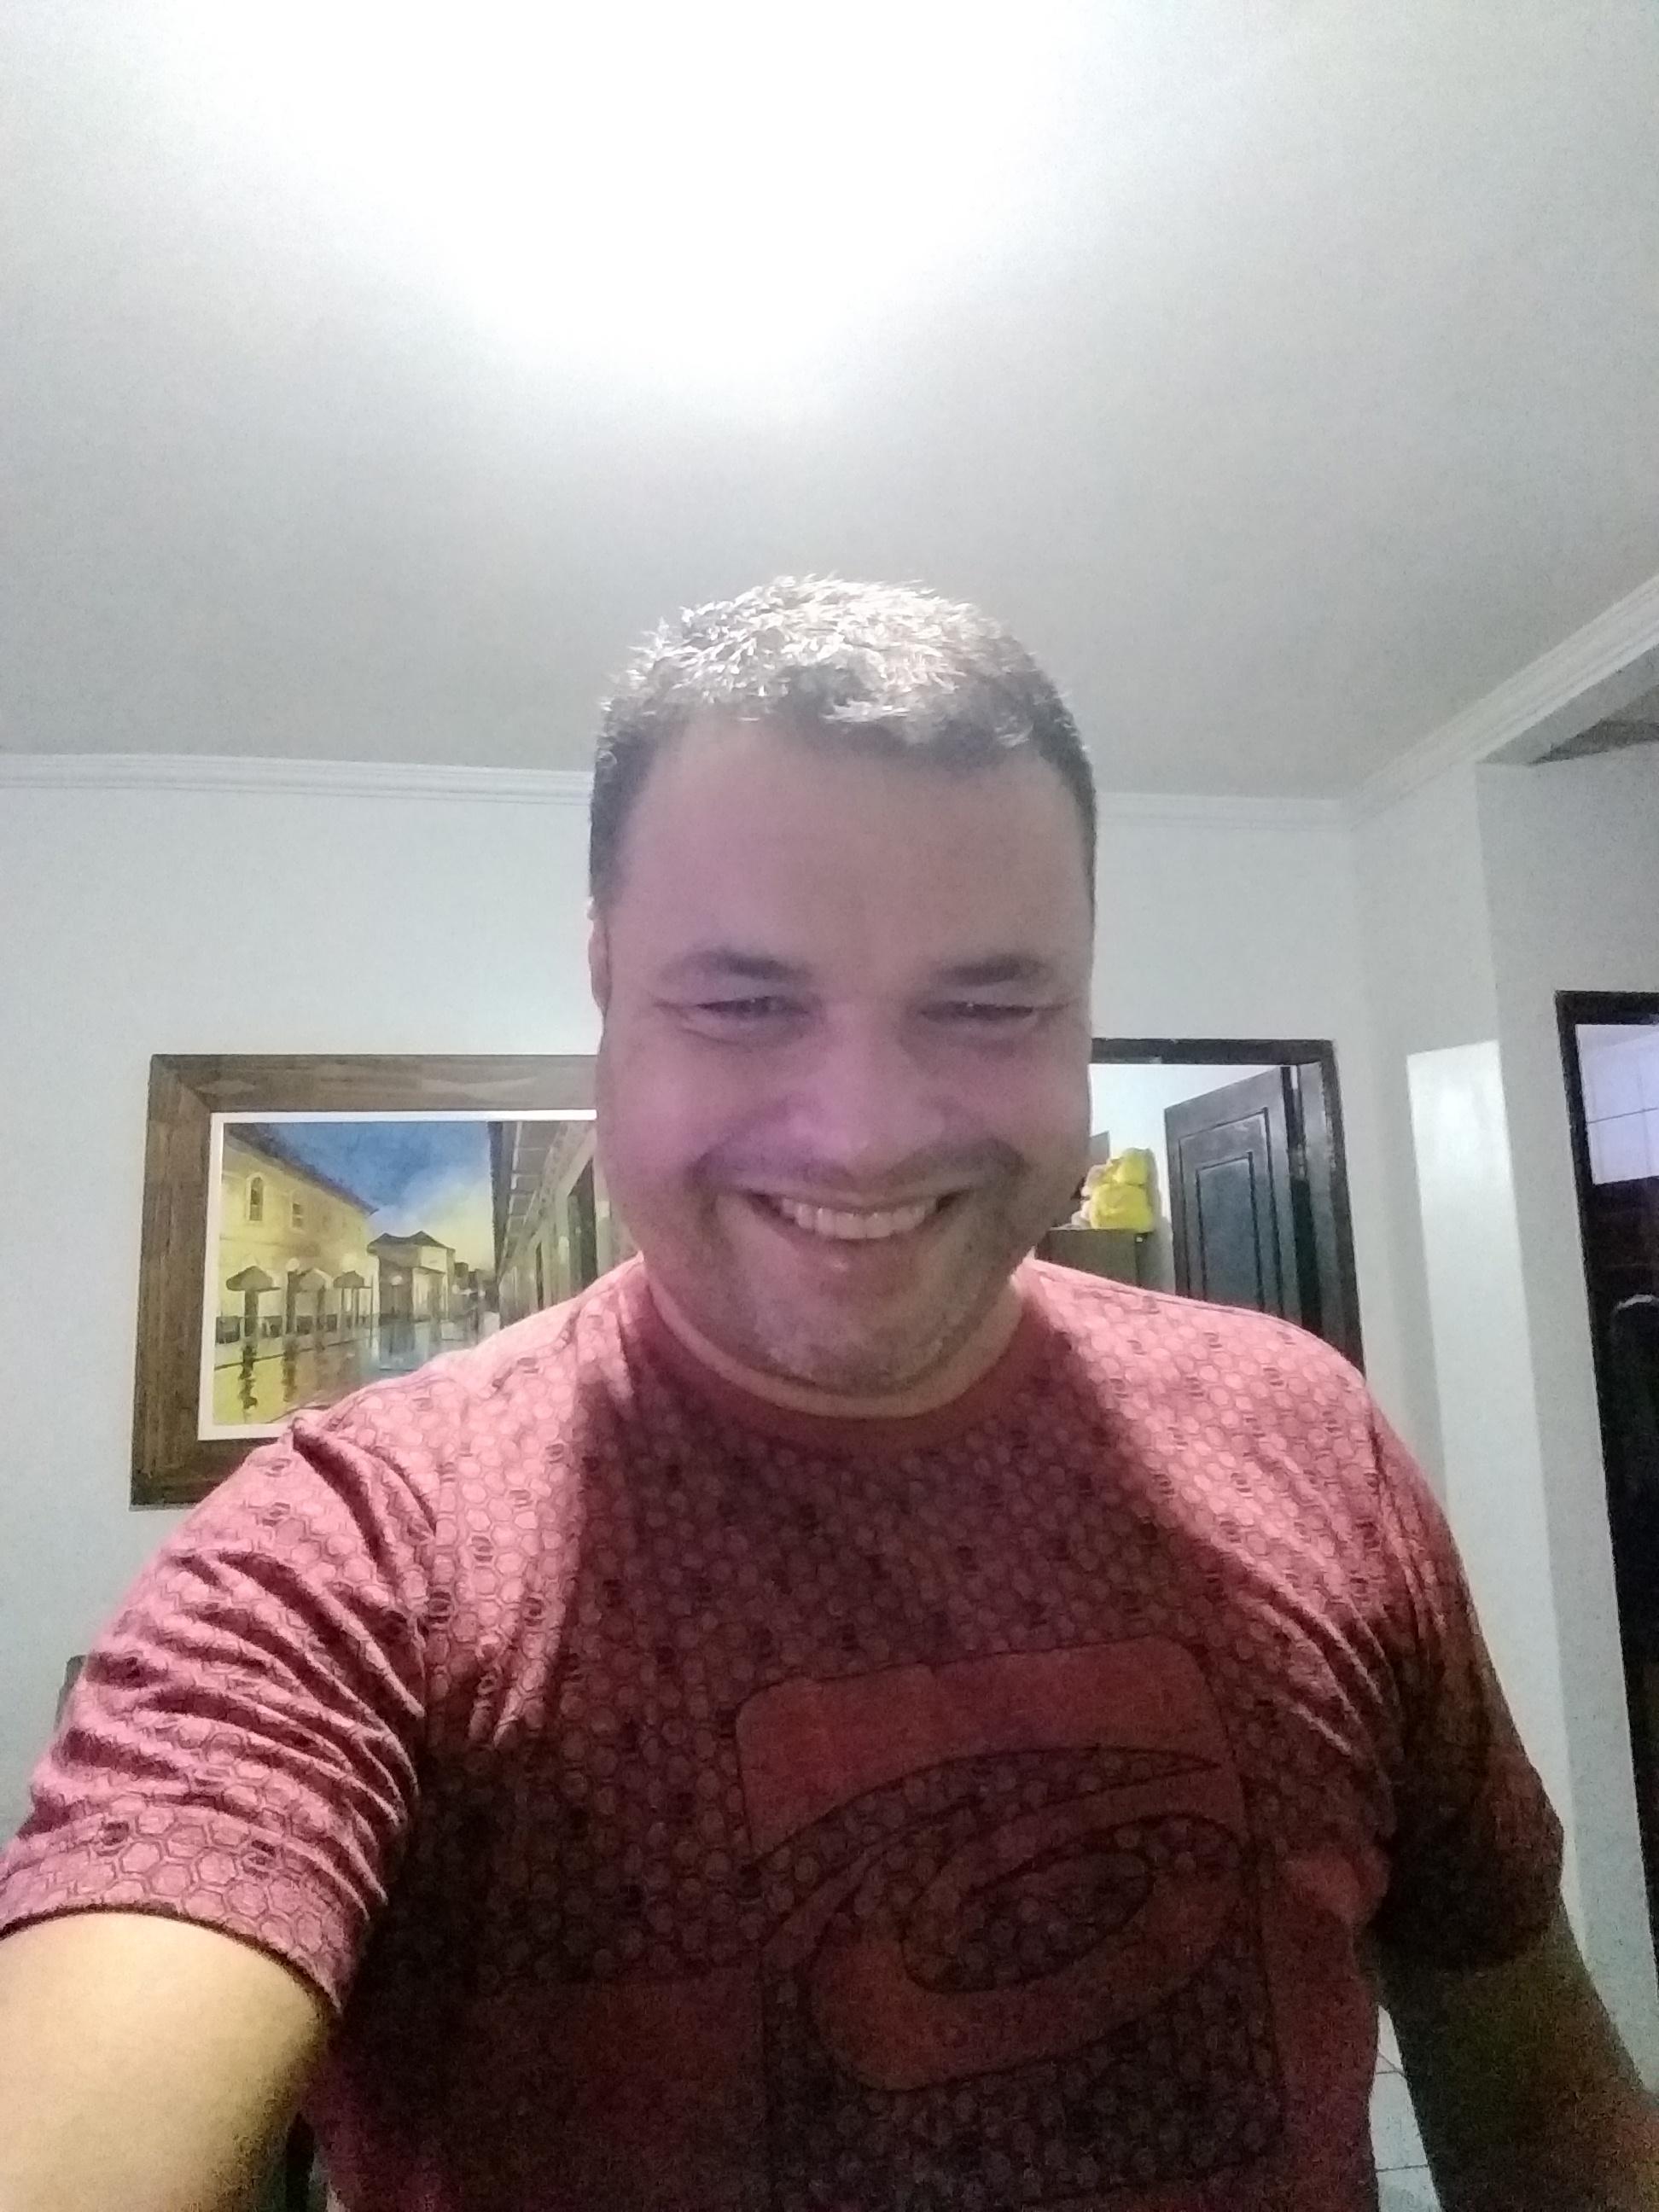 Roure Santos Ribeiro